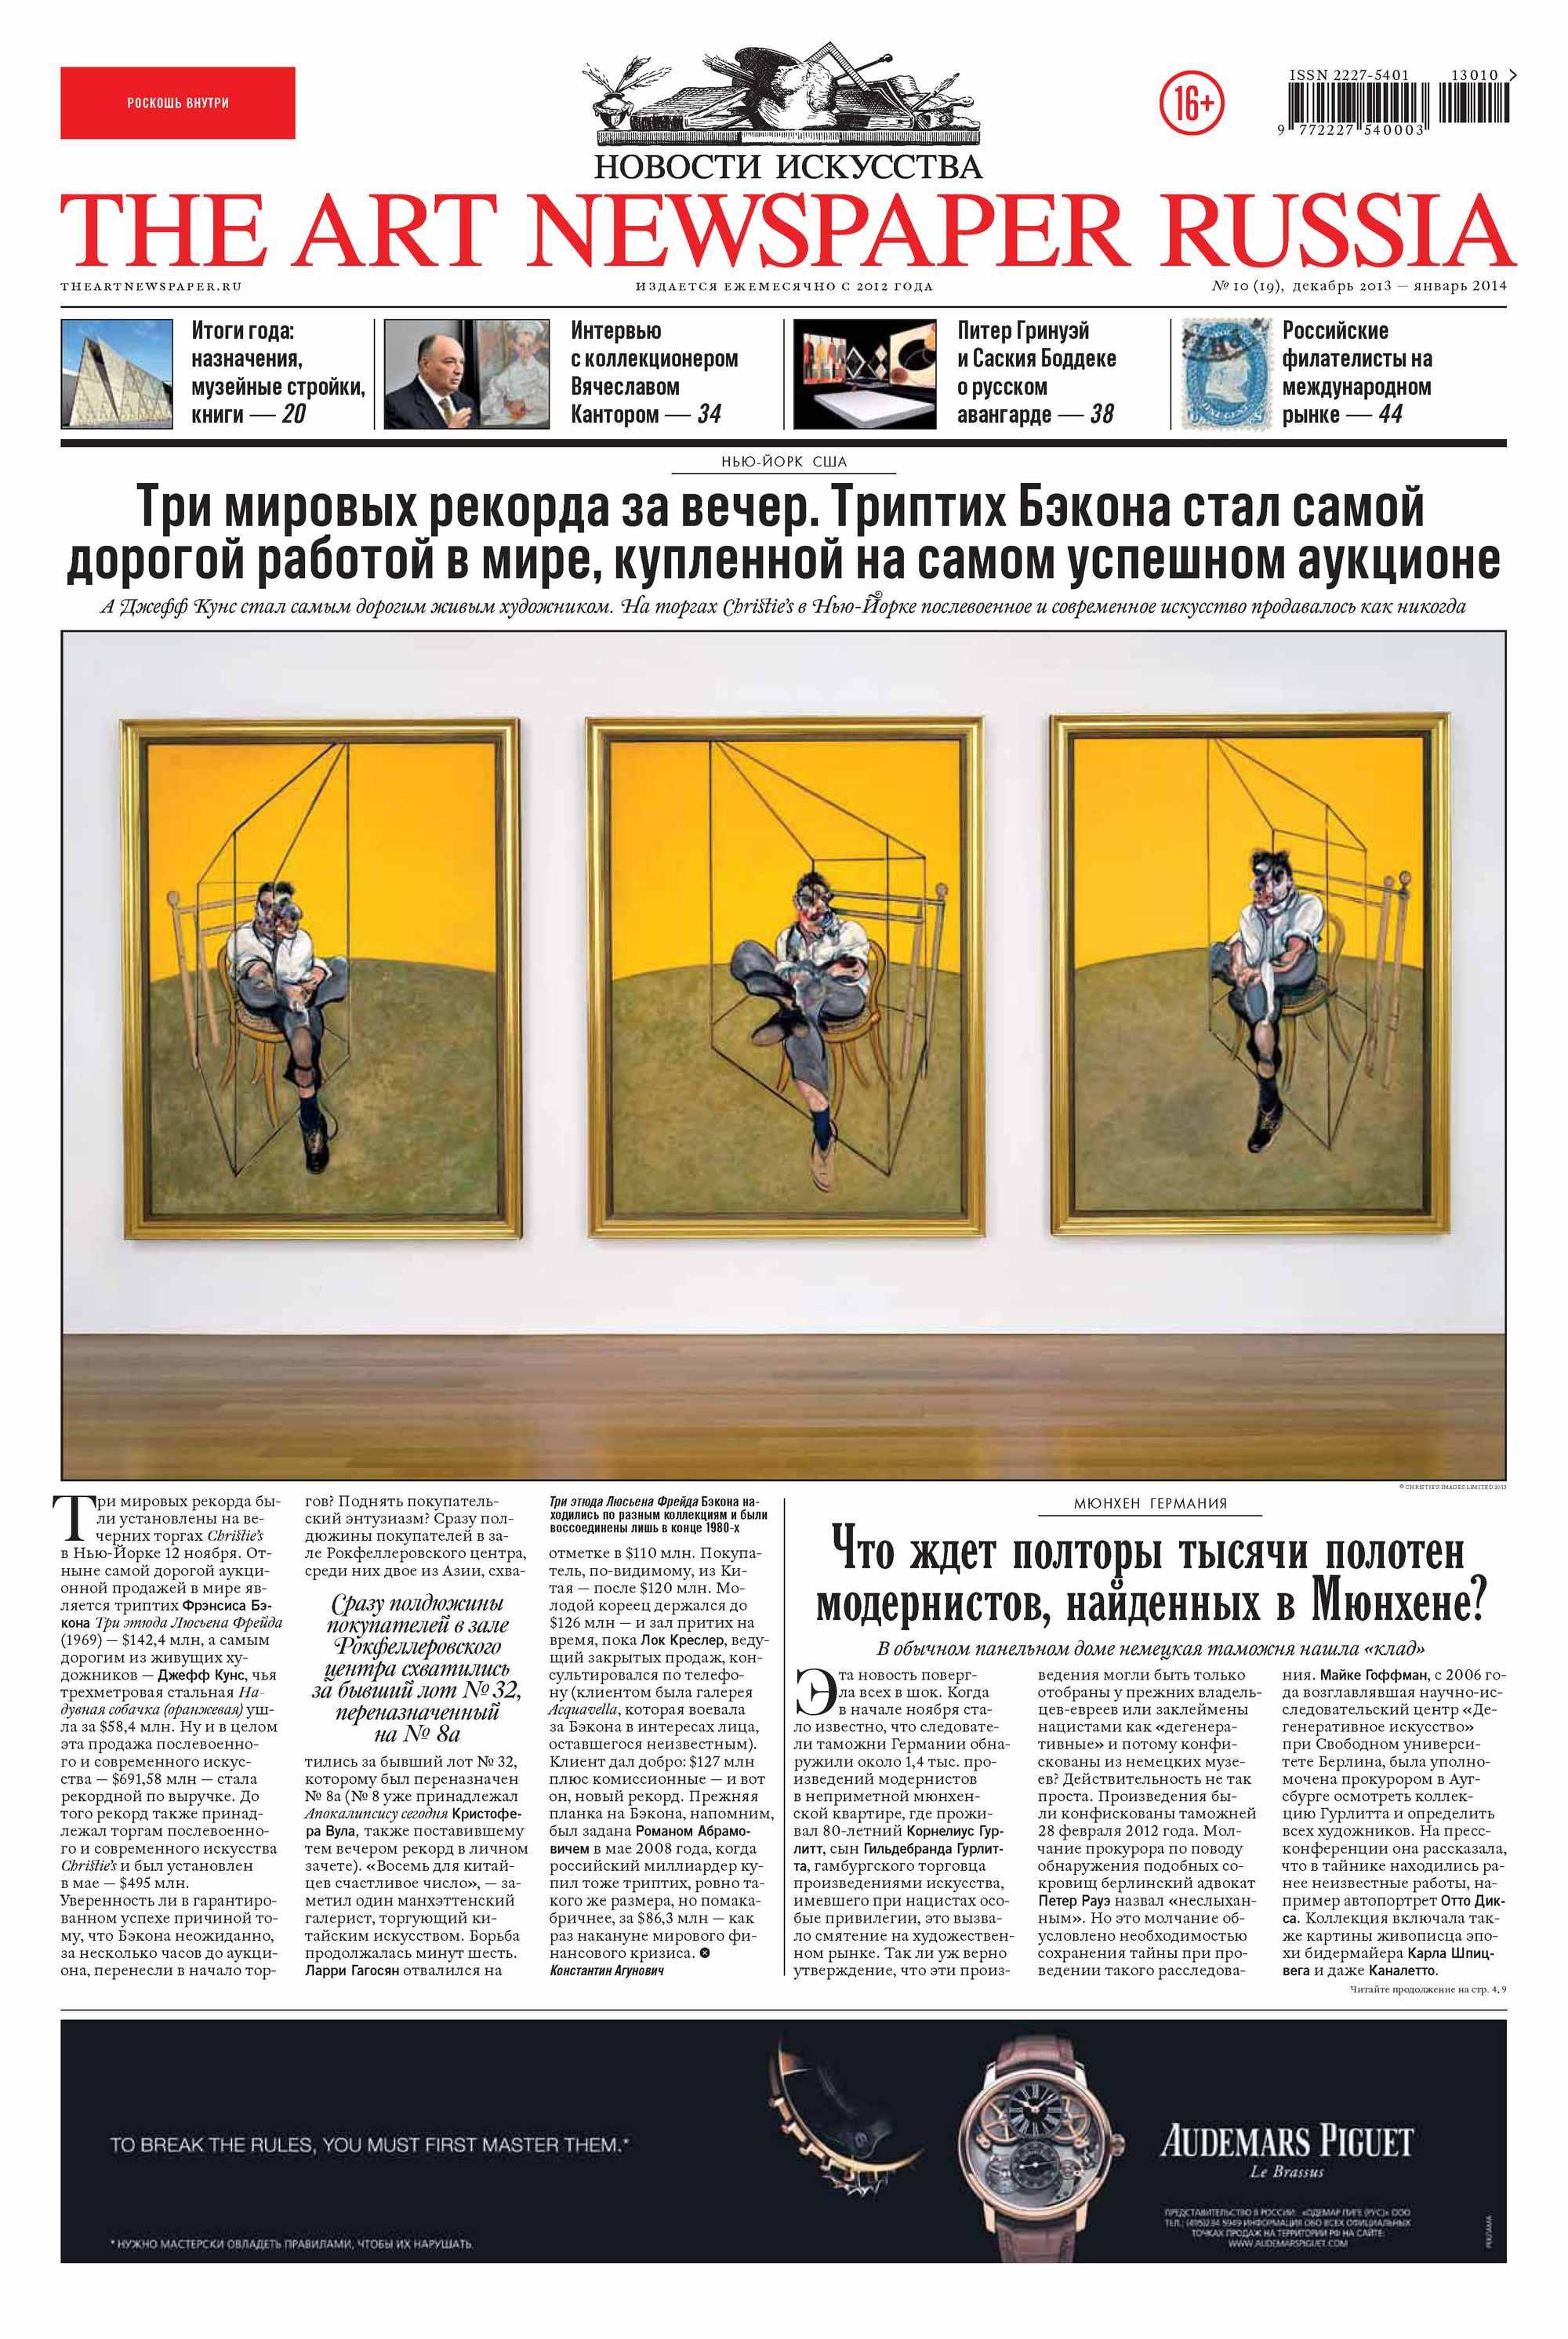 Отсутствует The Art Newspaper Russia №10 / декабрь 2013 – январь 2014 отсутствует the art newspaper russia 10 декабрь 2013 – январь 2014